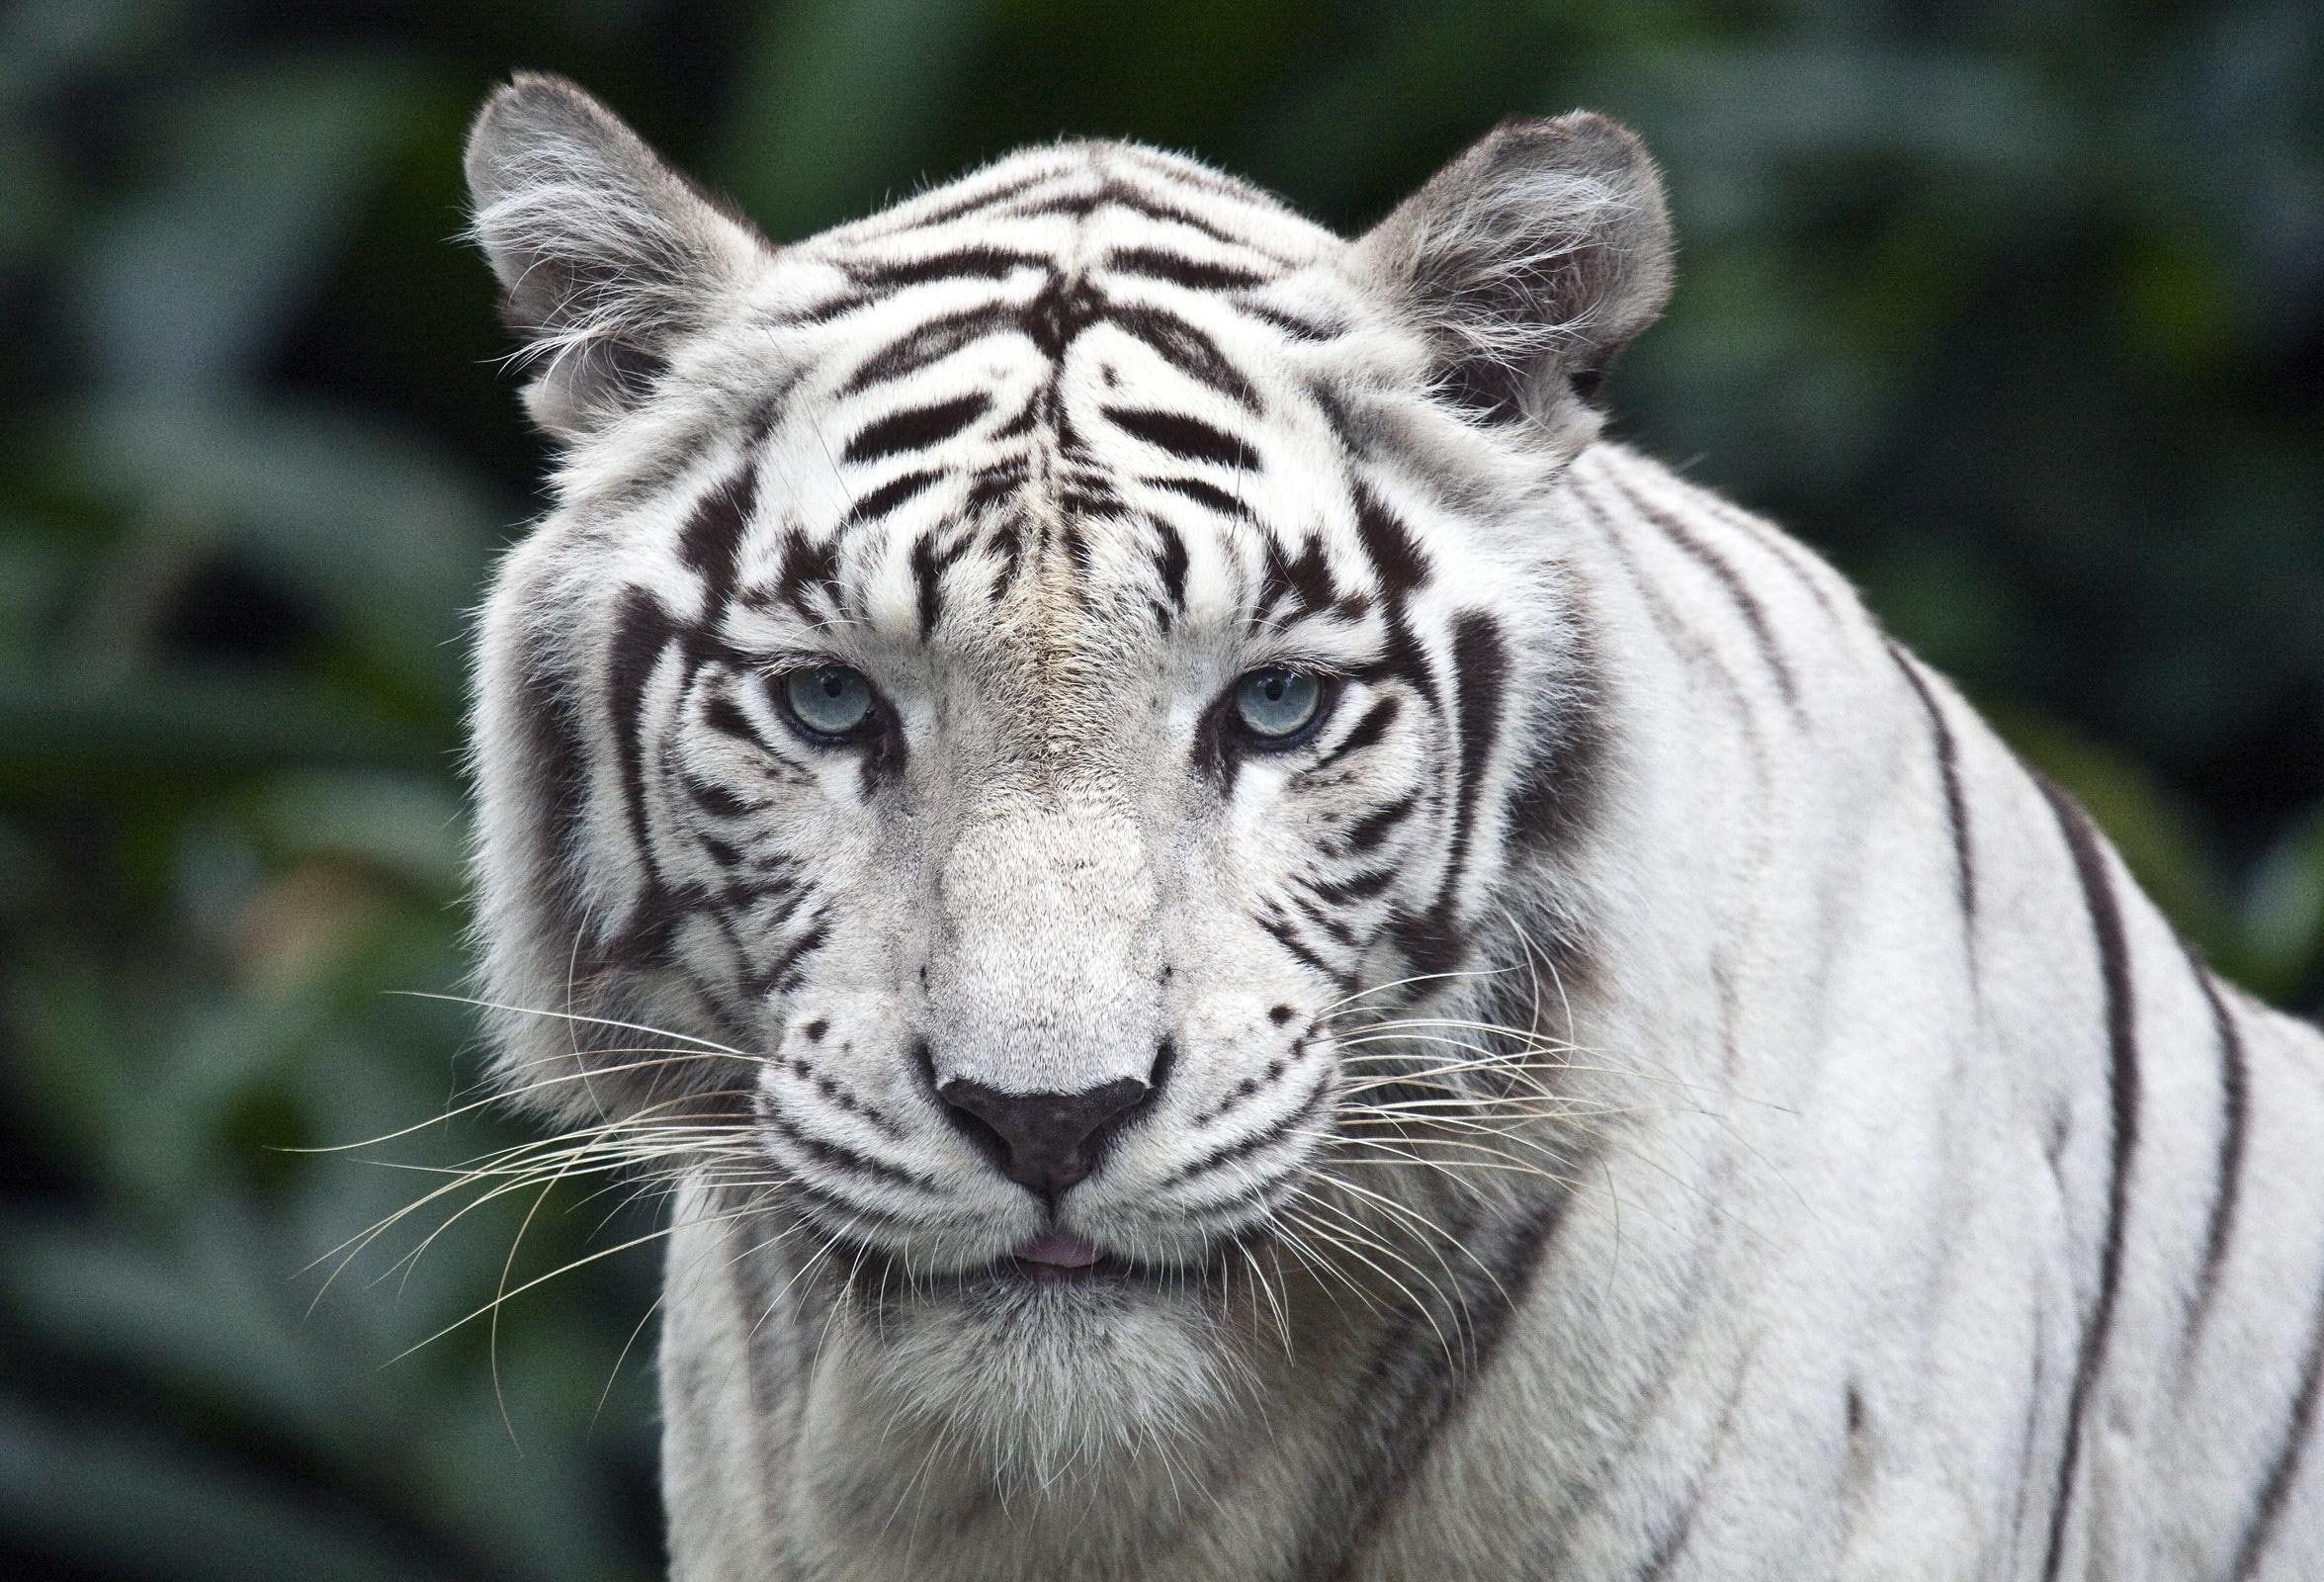 Tigre Branco fauna felino lindo animal natureza